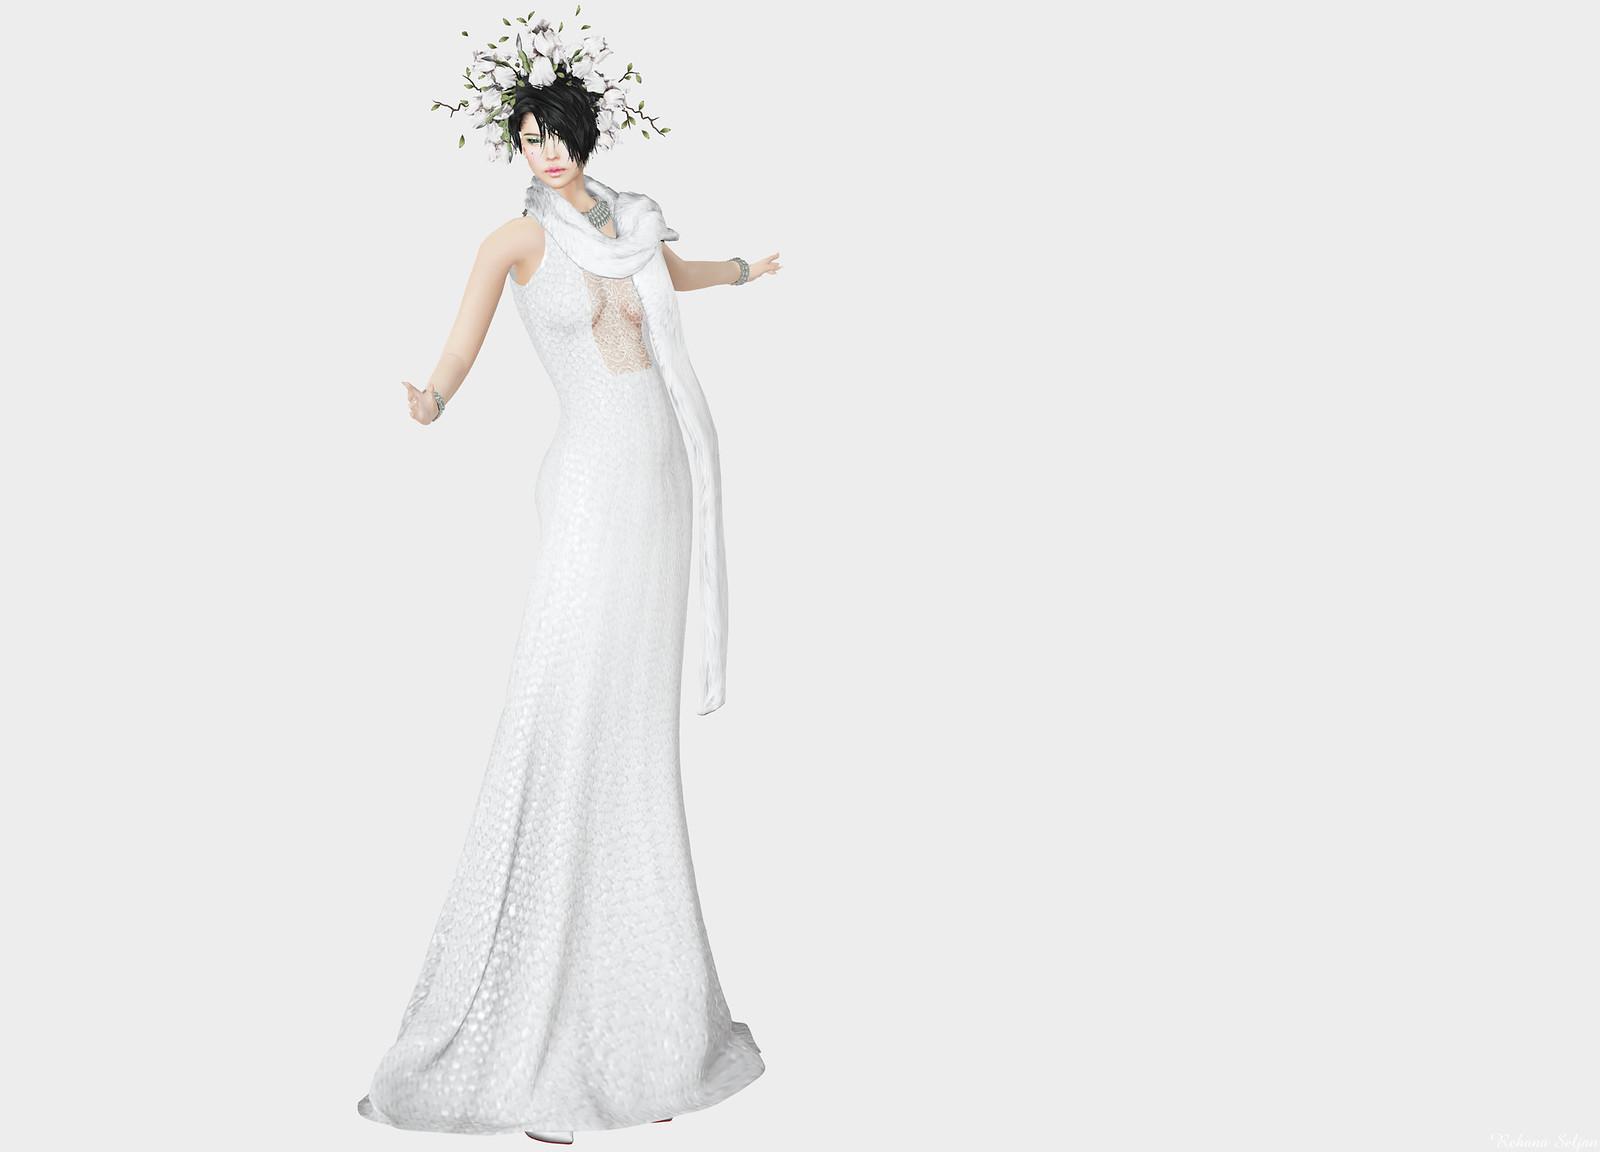 Armony - Mystique Gown Bridal